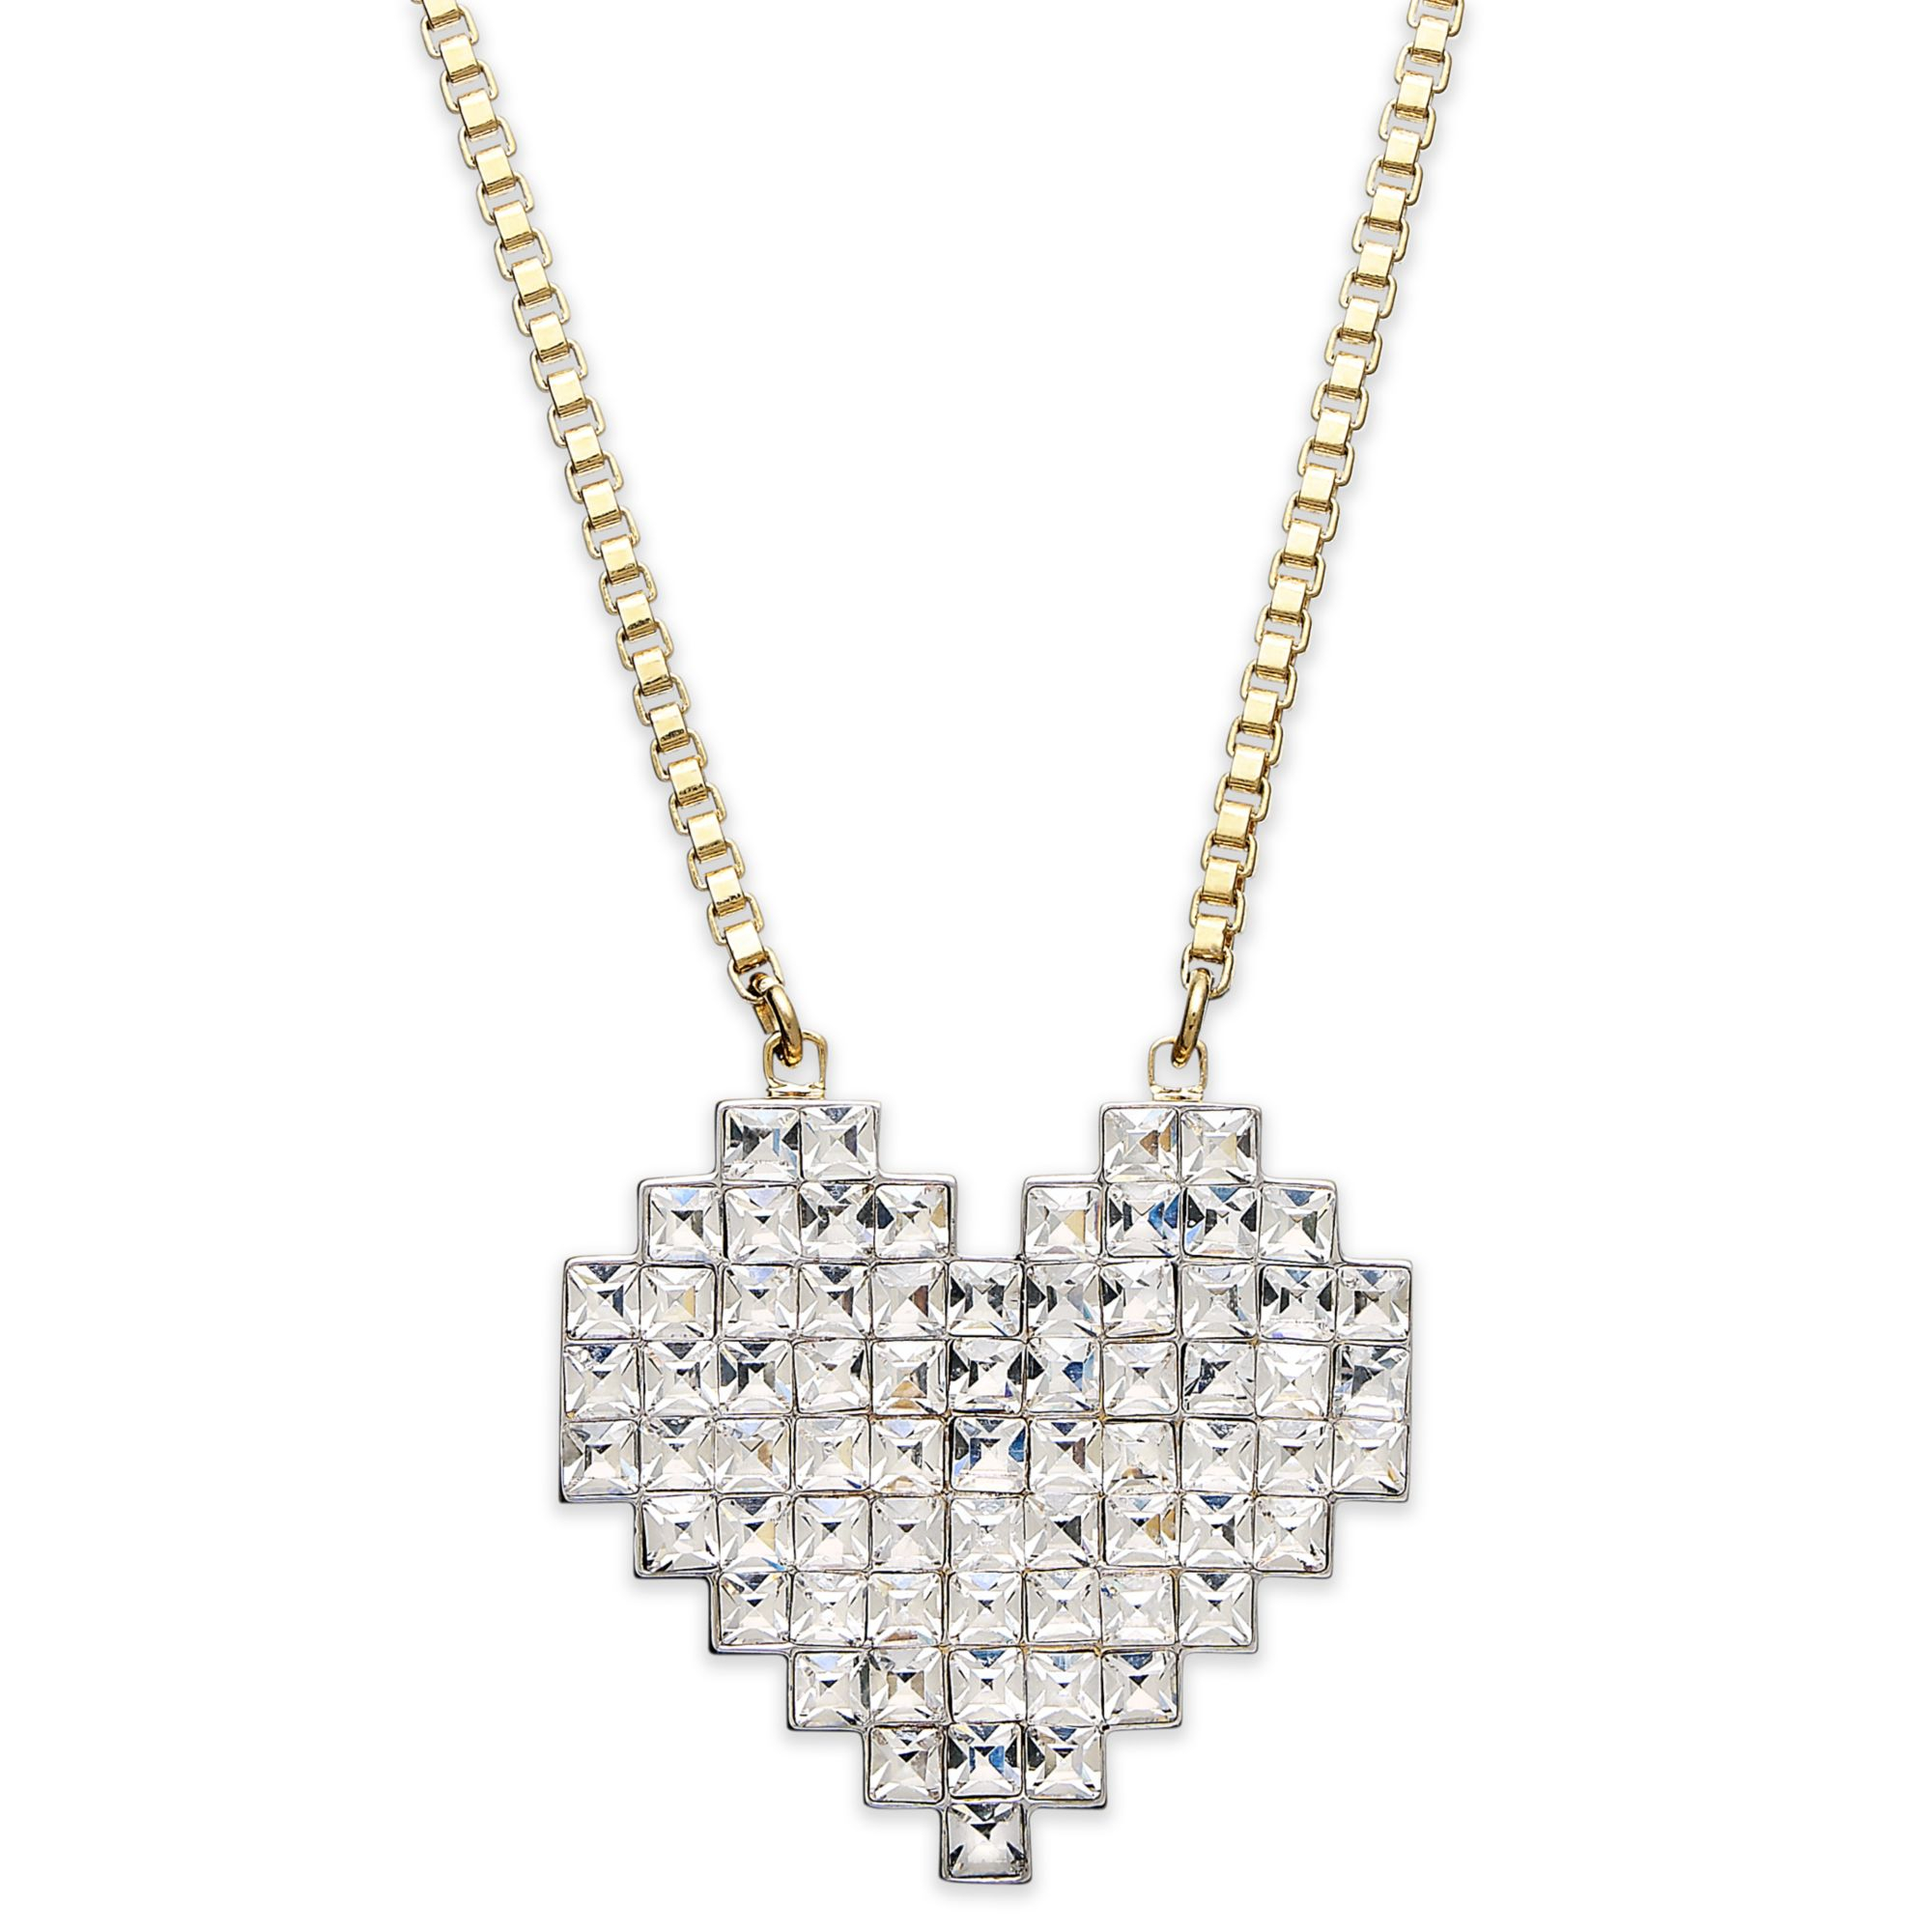 Juicy couture goldtone pixel heart pendant necklace in for Juicy couture jewelry necklace